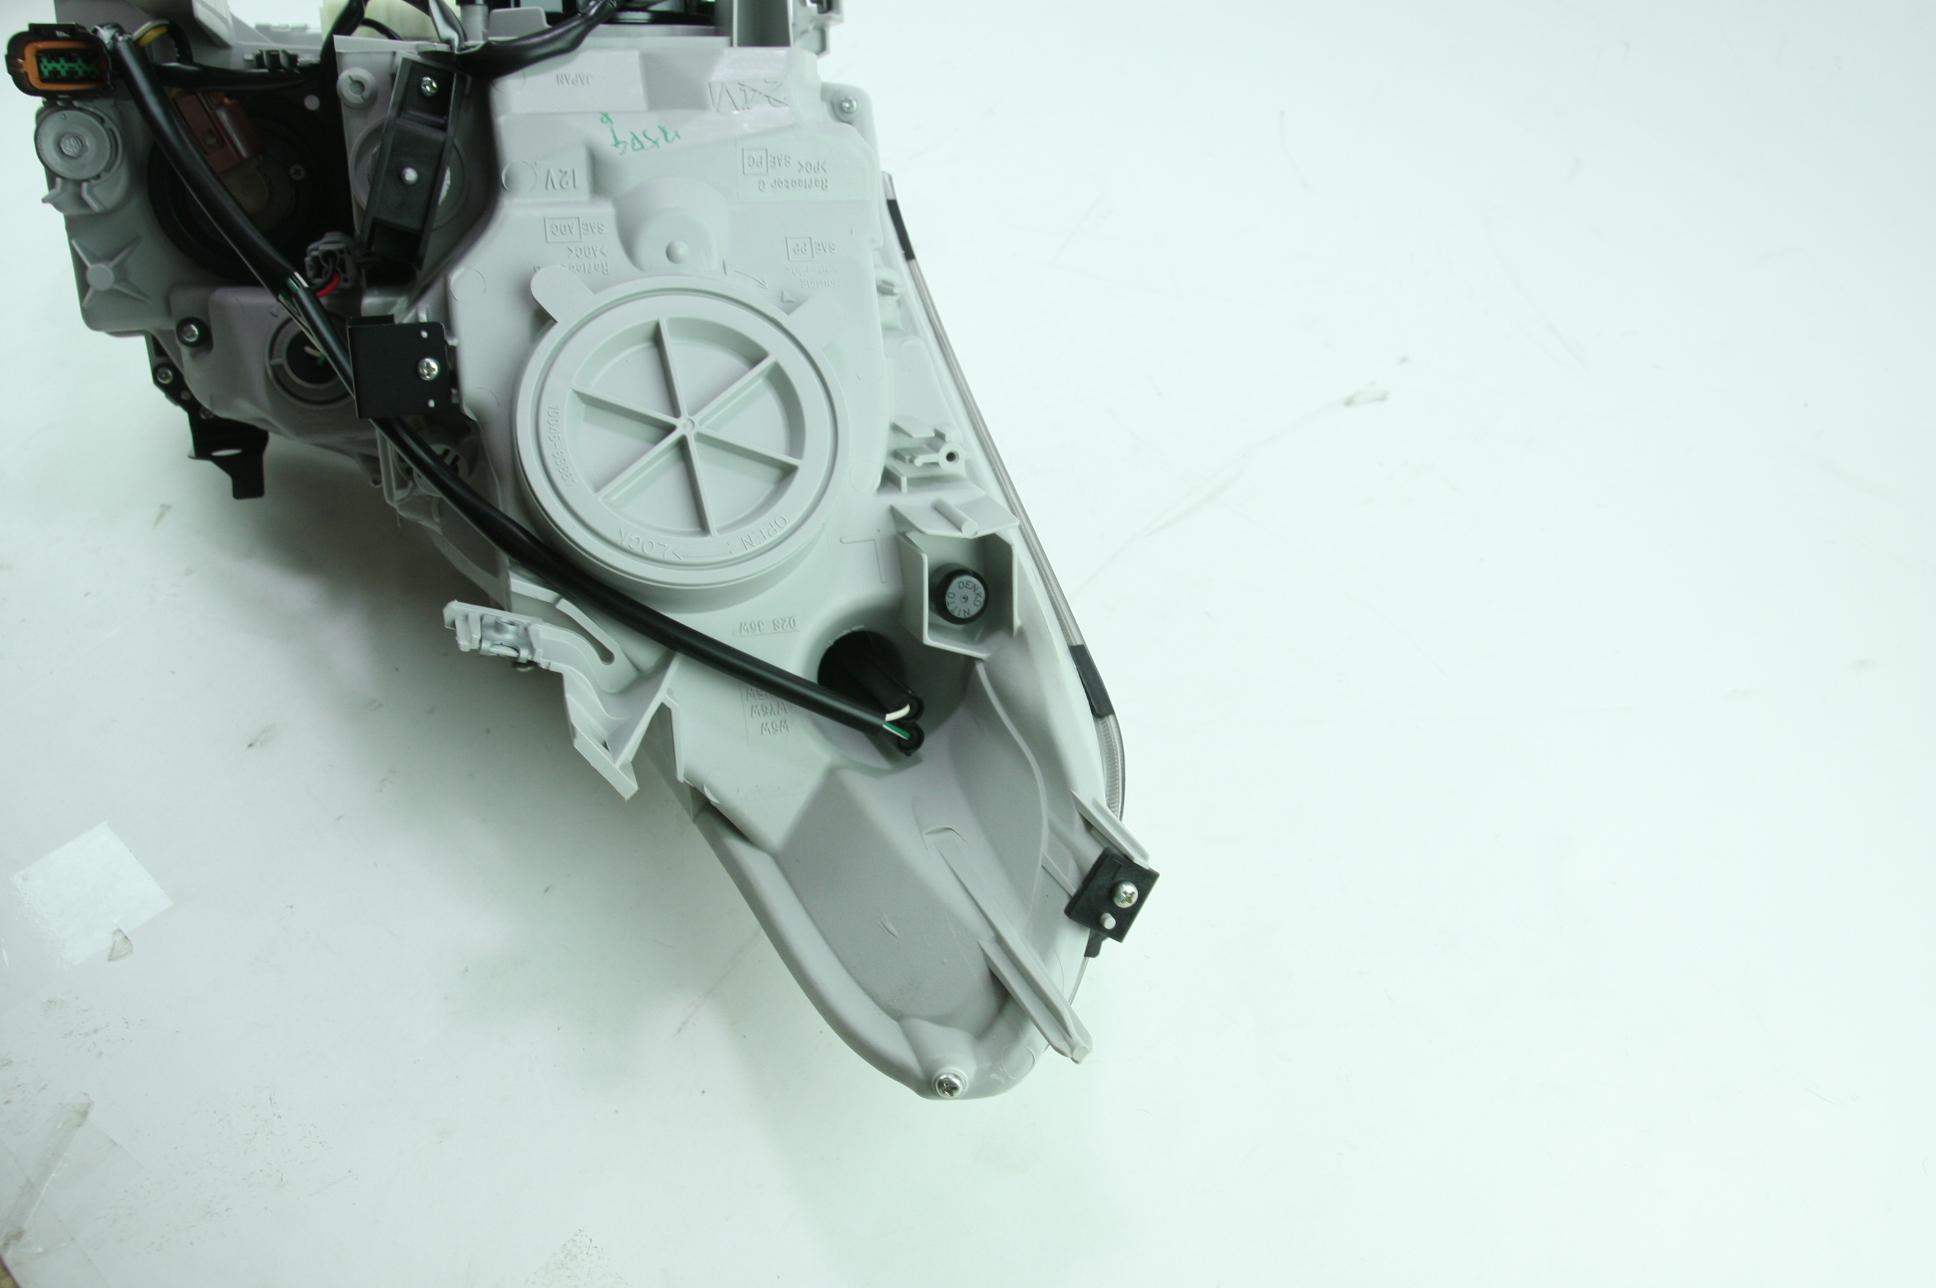 * Infiniti G37 Sedan Headlight LH Driver Side Genuine Nissan OEM 26060JK60E New - image 11